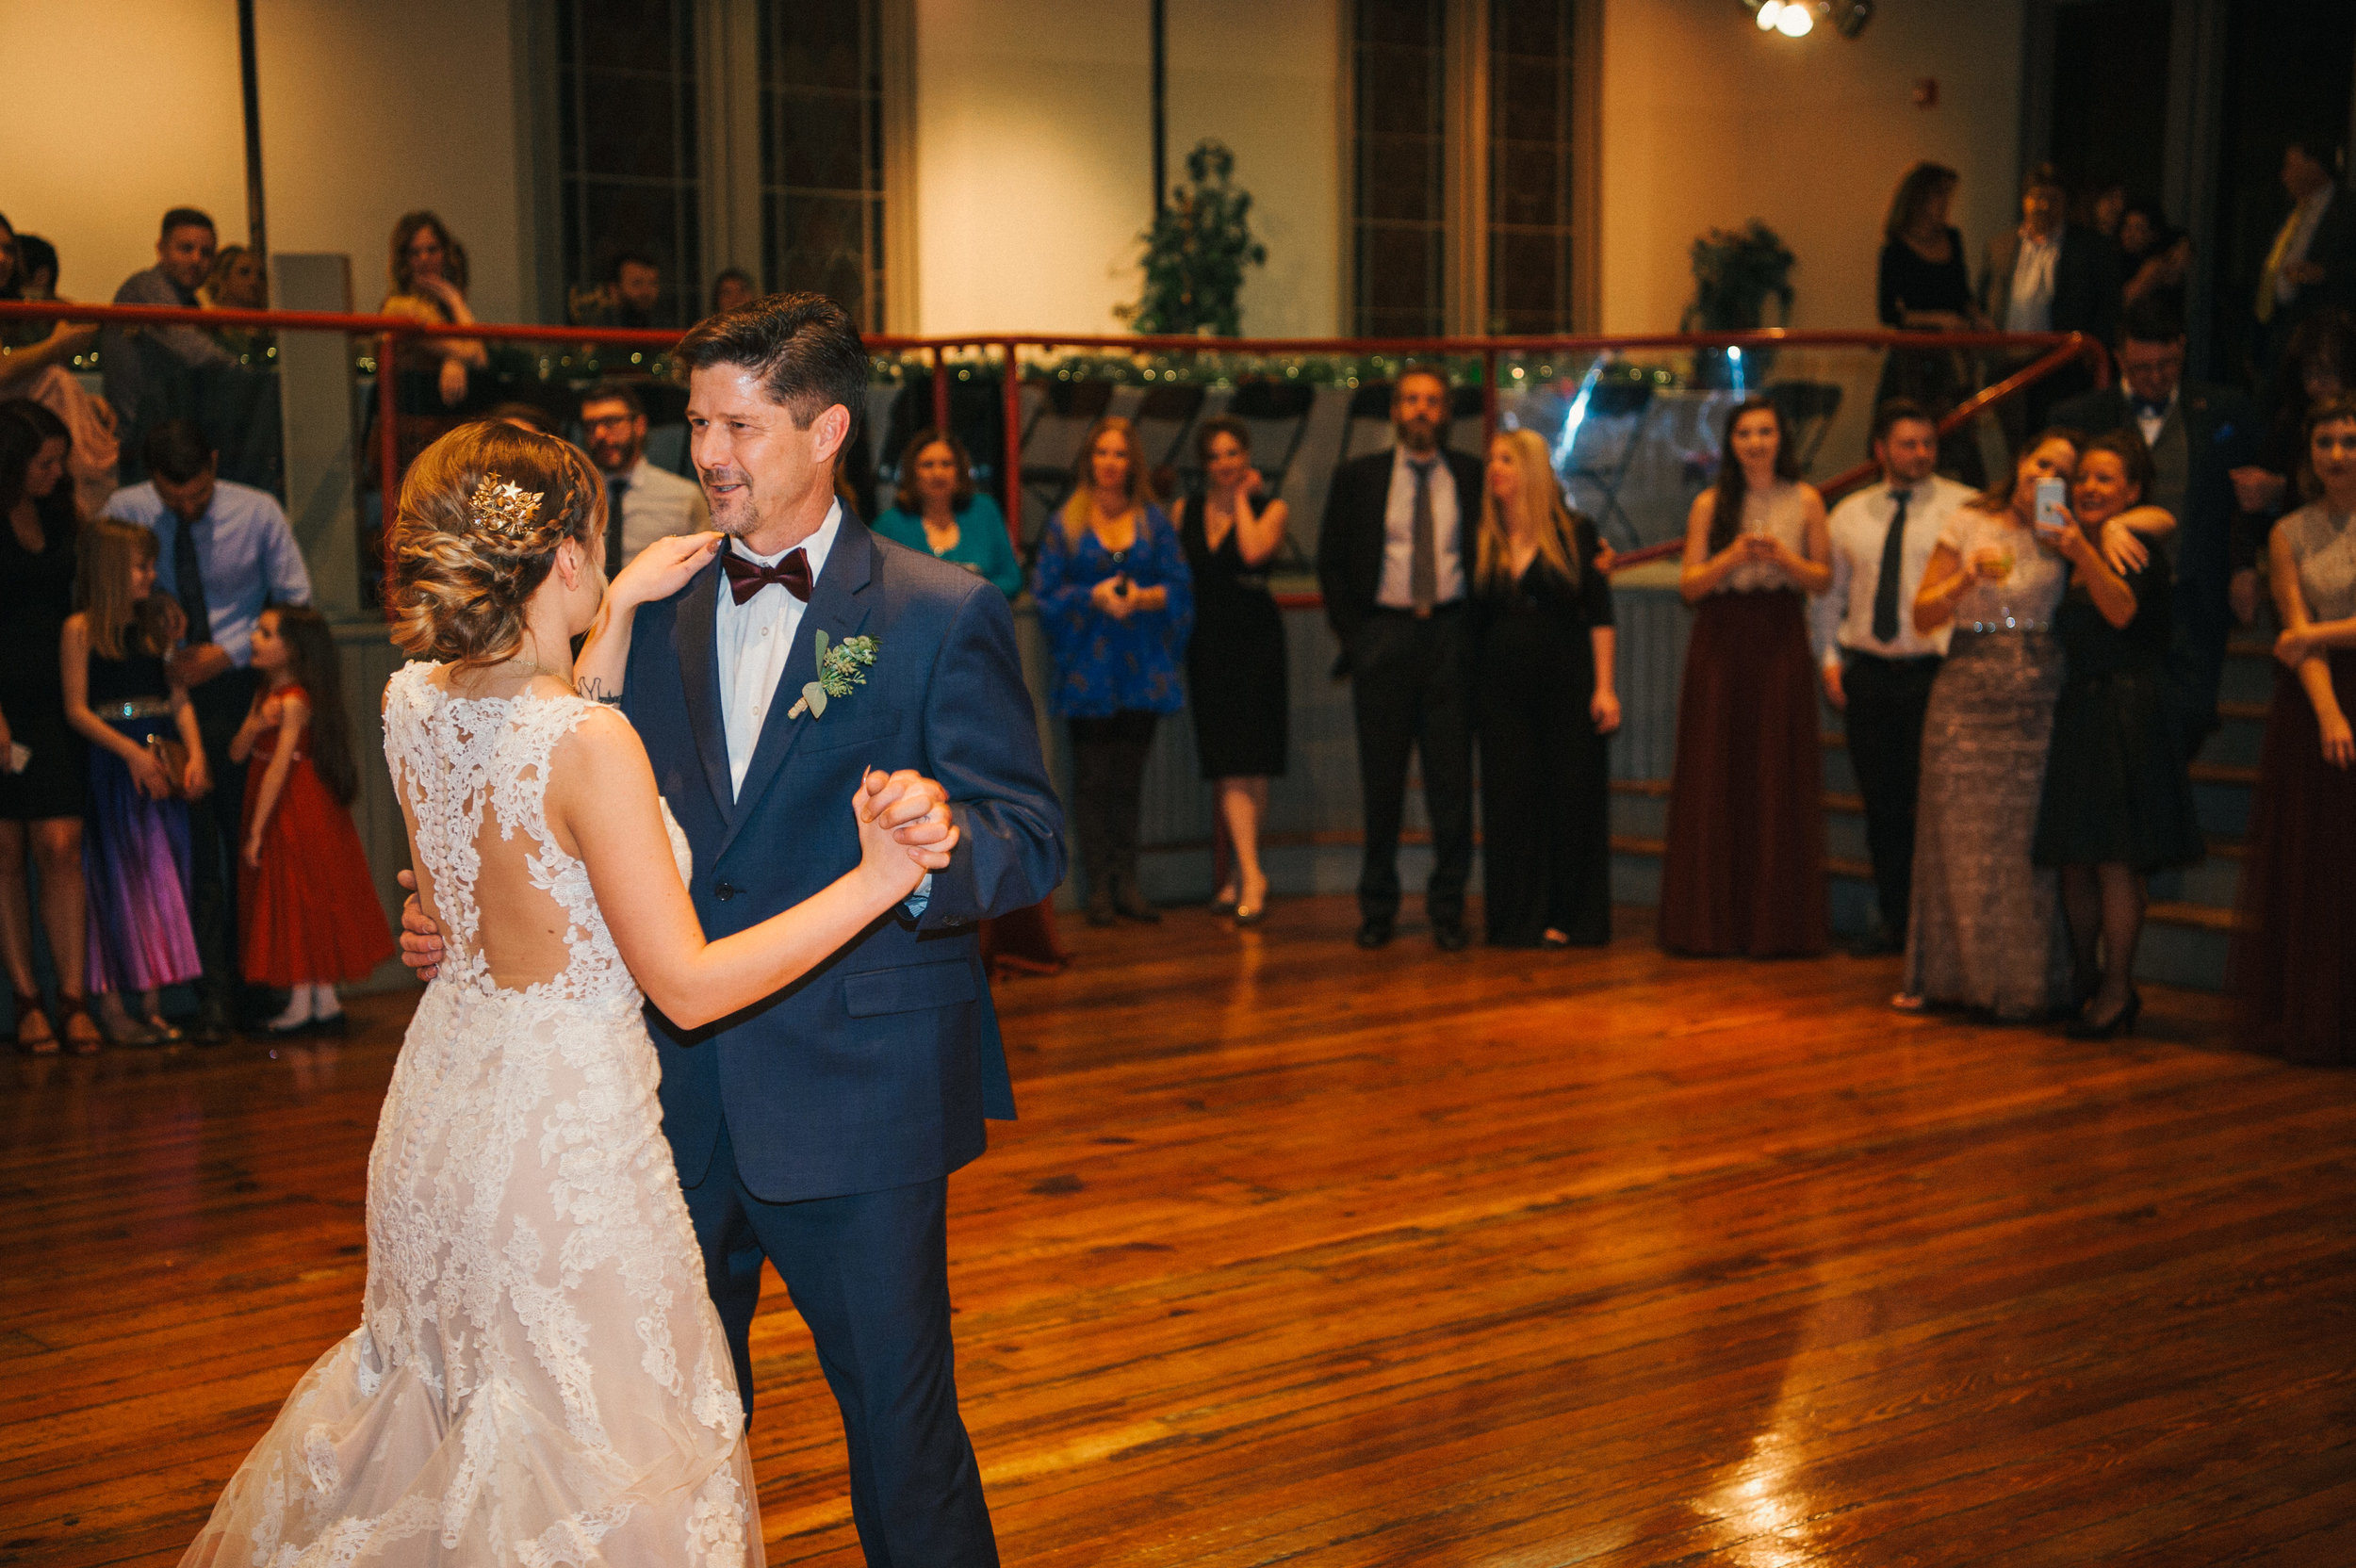 Amber and Kyles Wedding 112.jpg